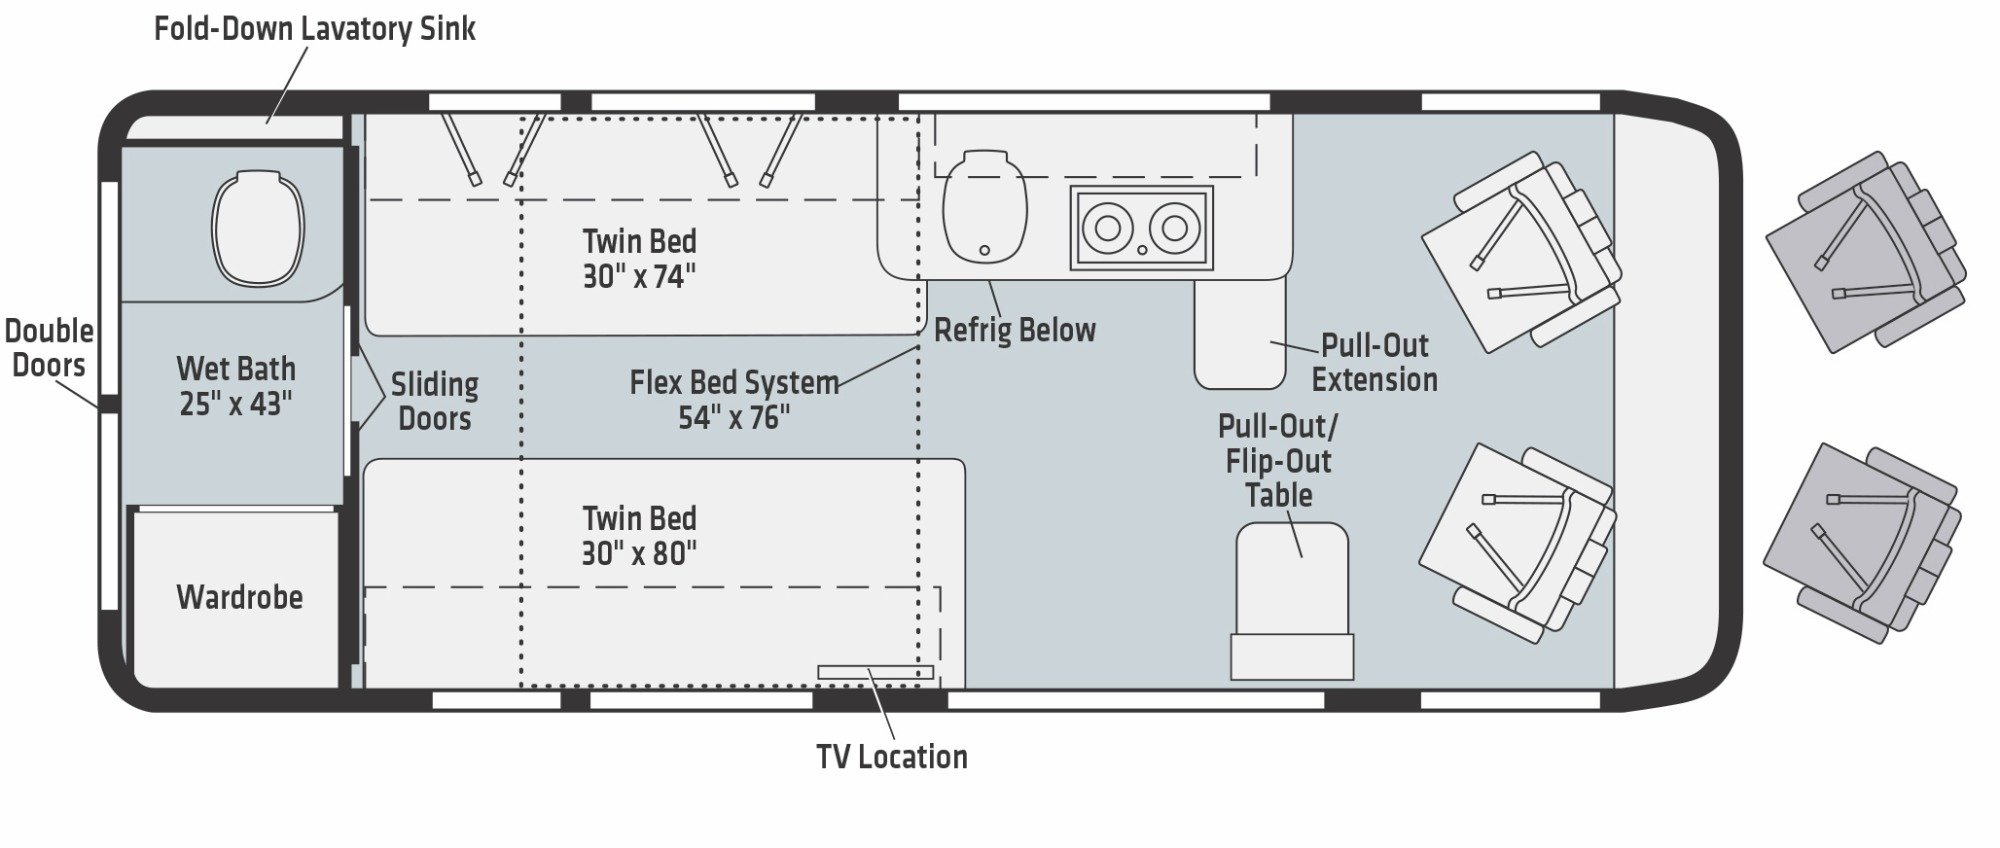 View Floor Plan for 2021 WINNEBAGO TRAVATO 59K